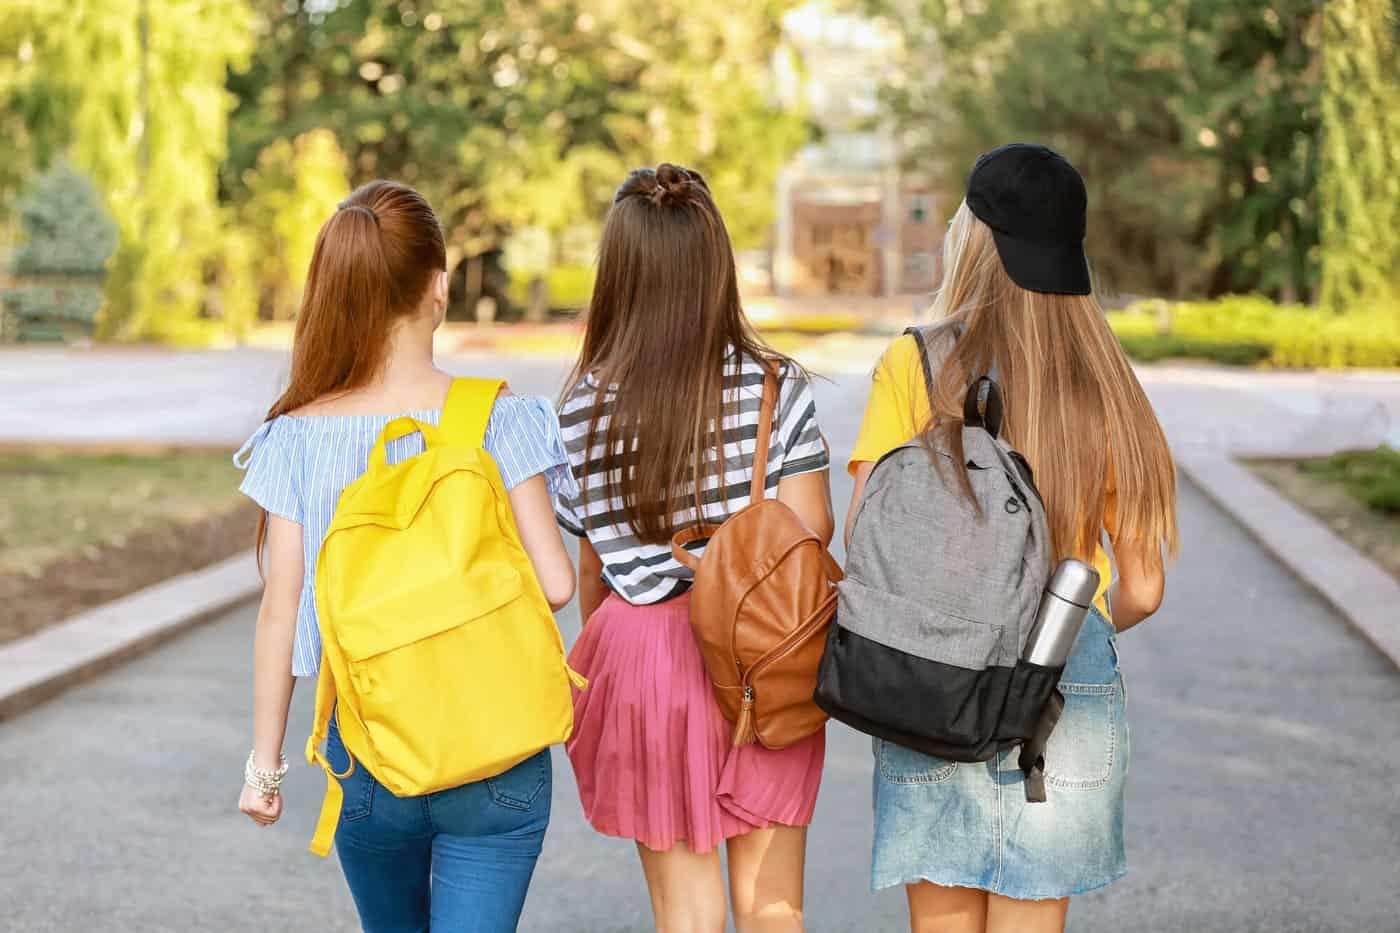 College girls wearing cute bags